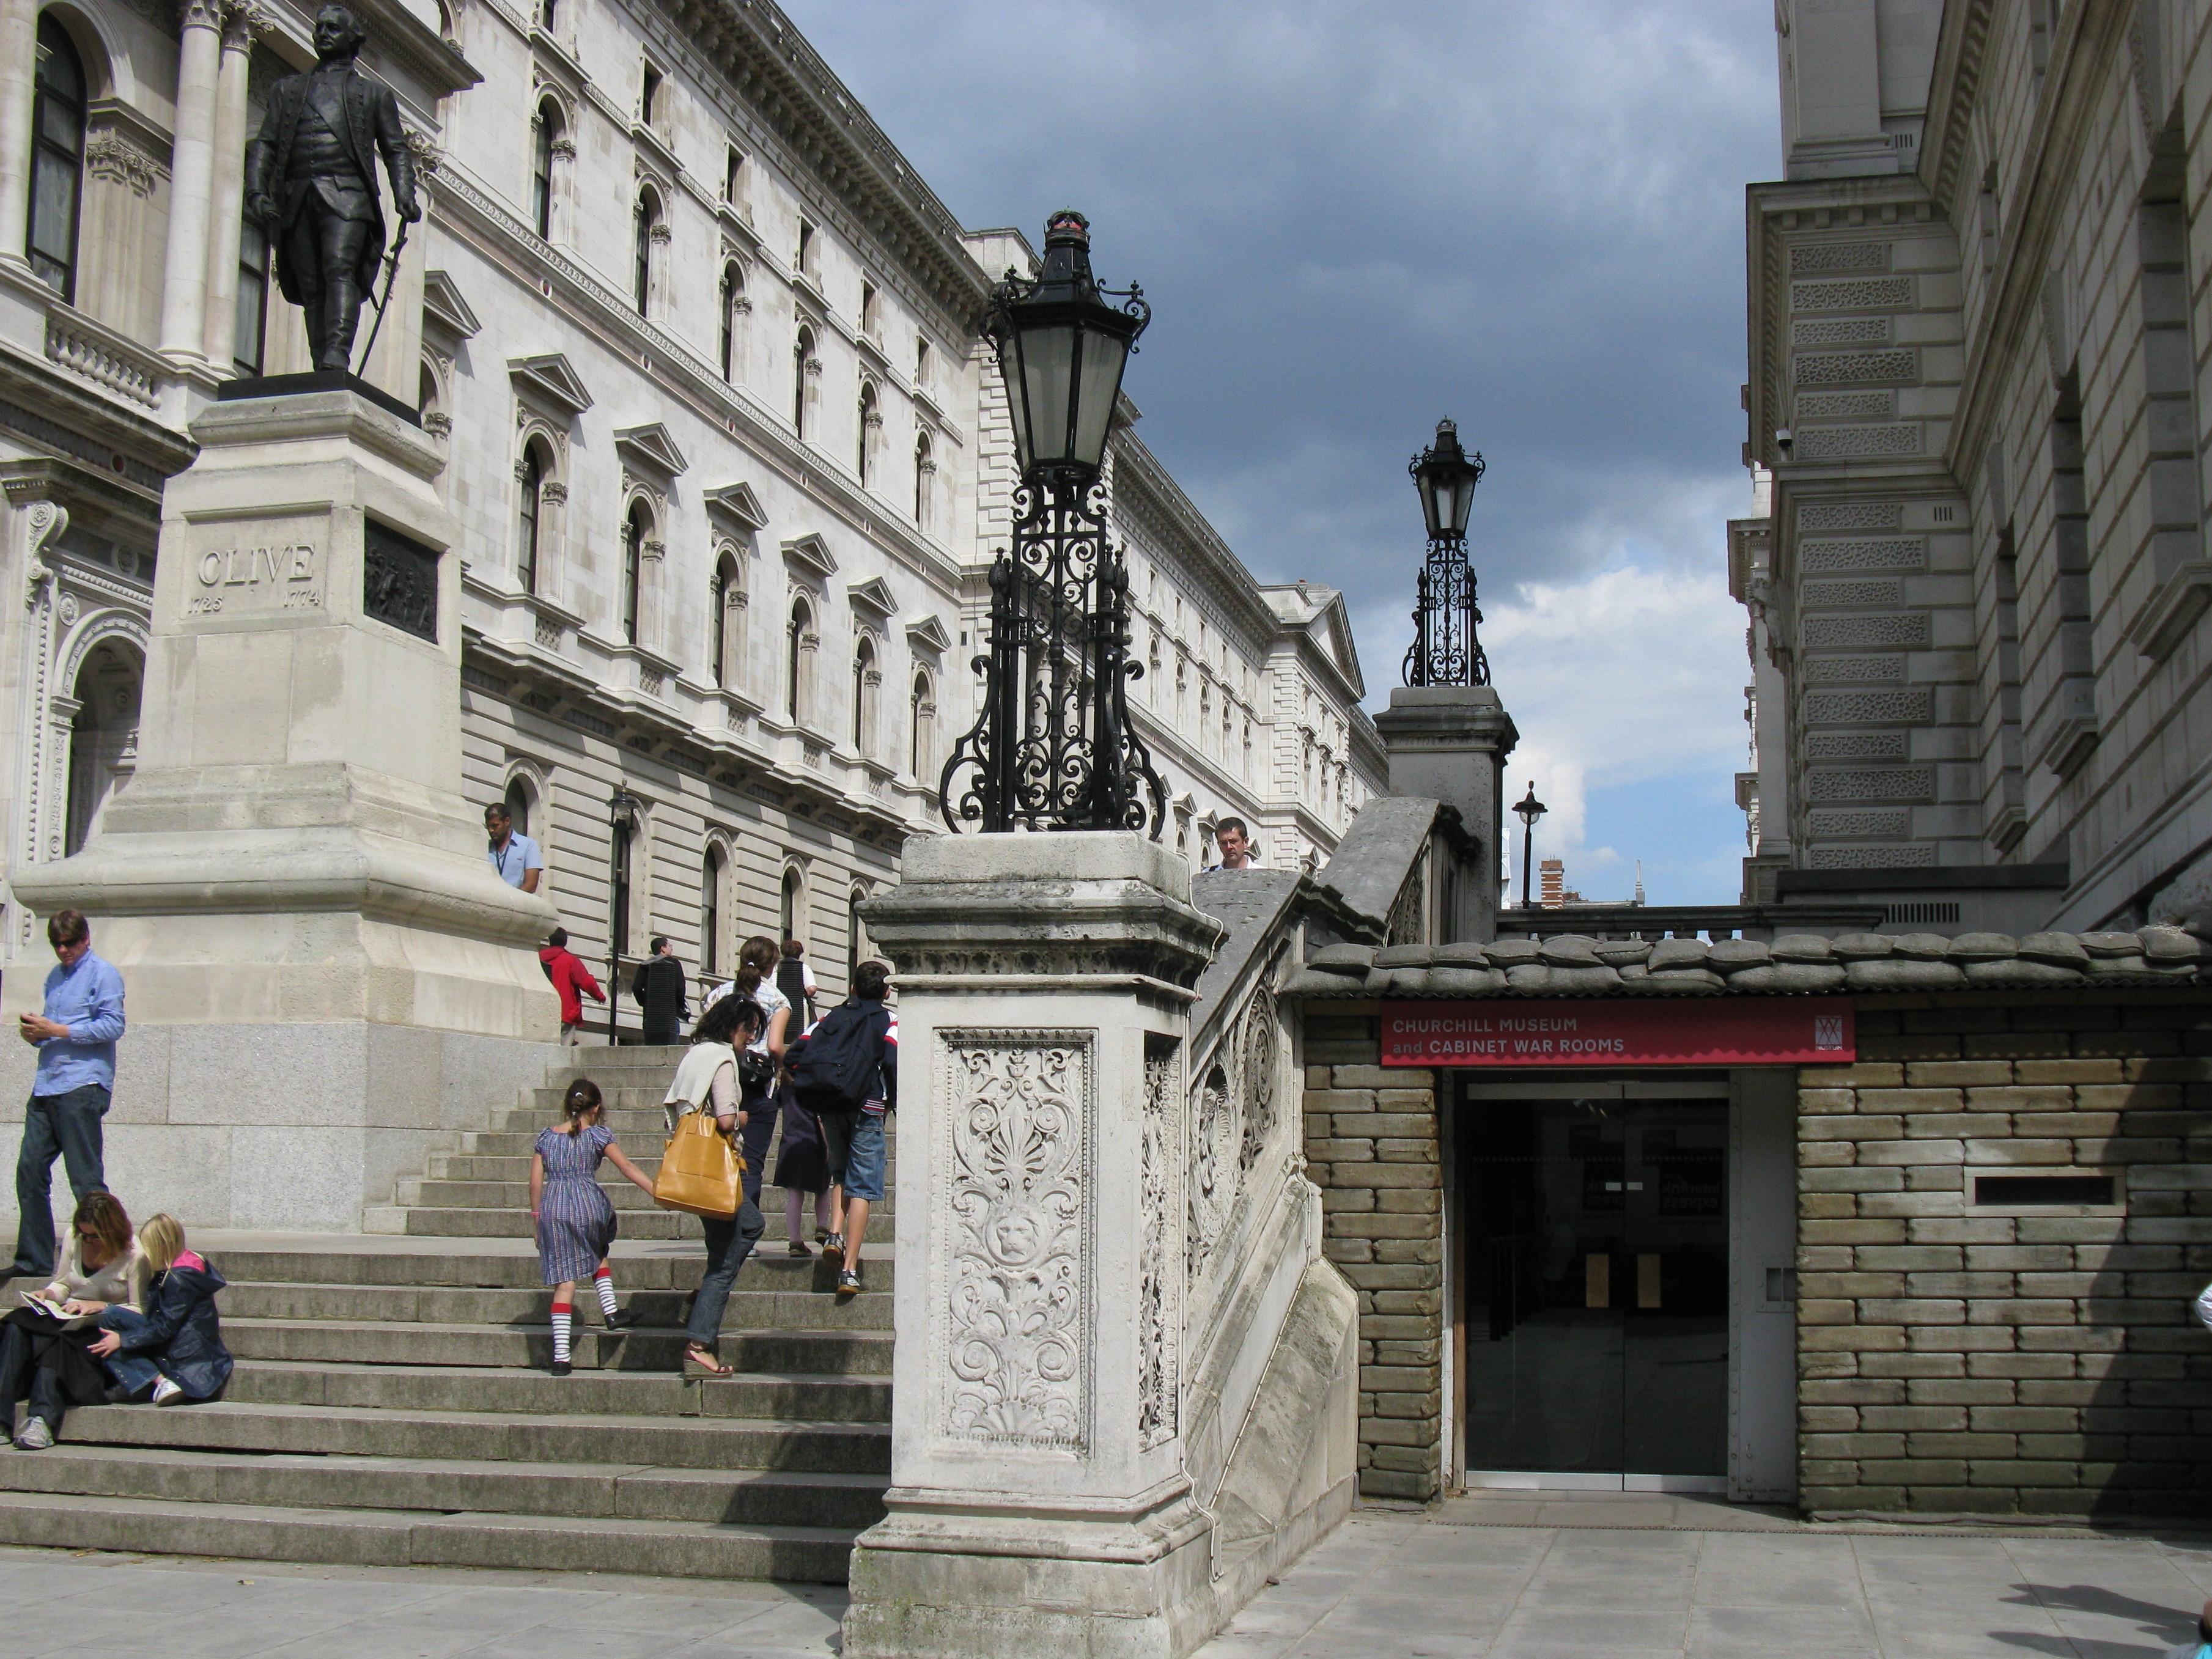 Churchillmuseumcabinetwarrooms.JPG